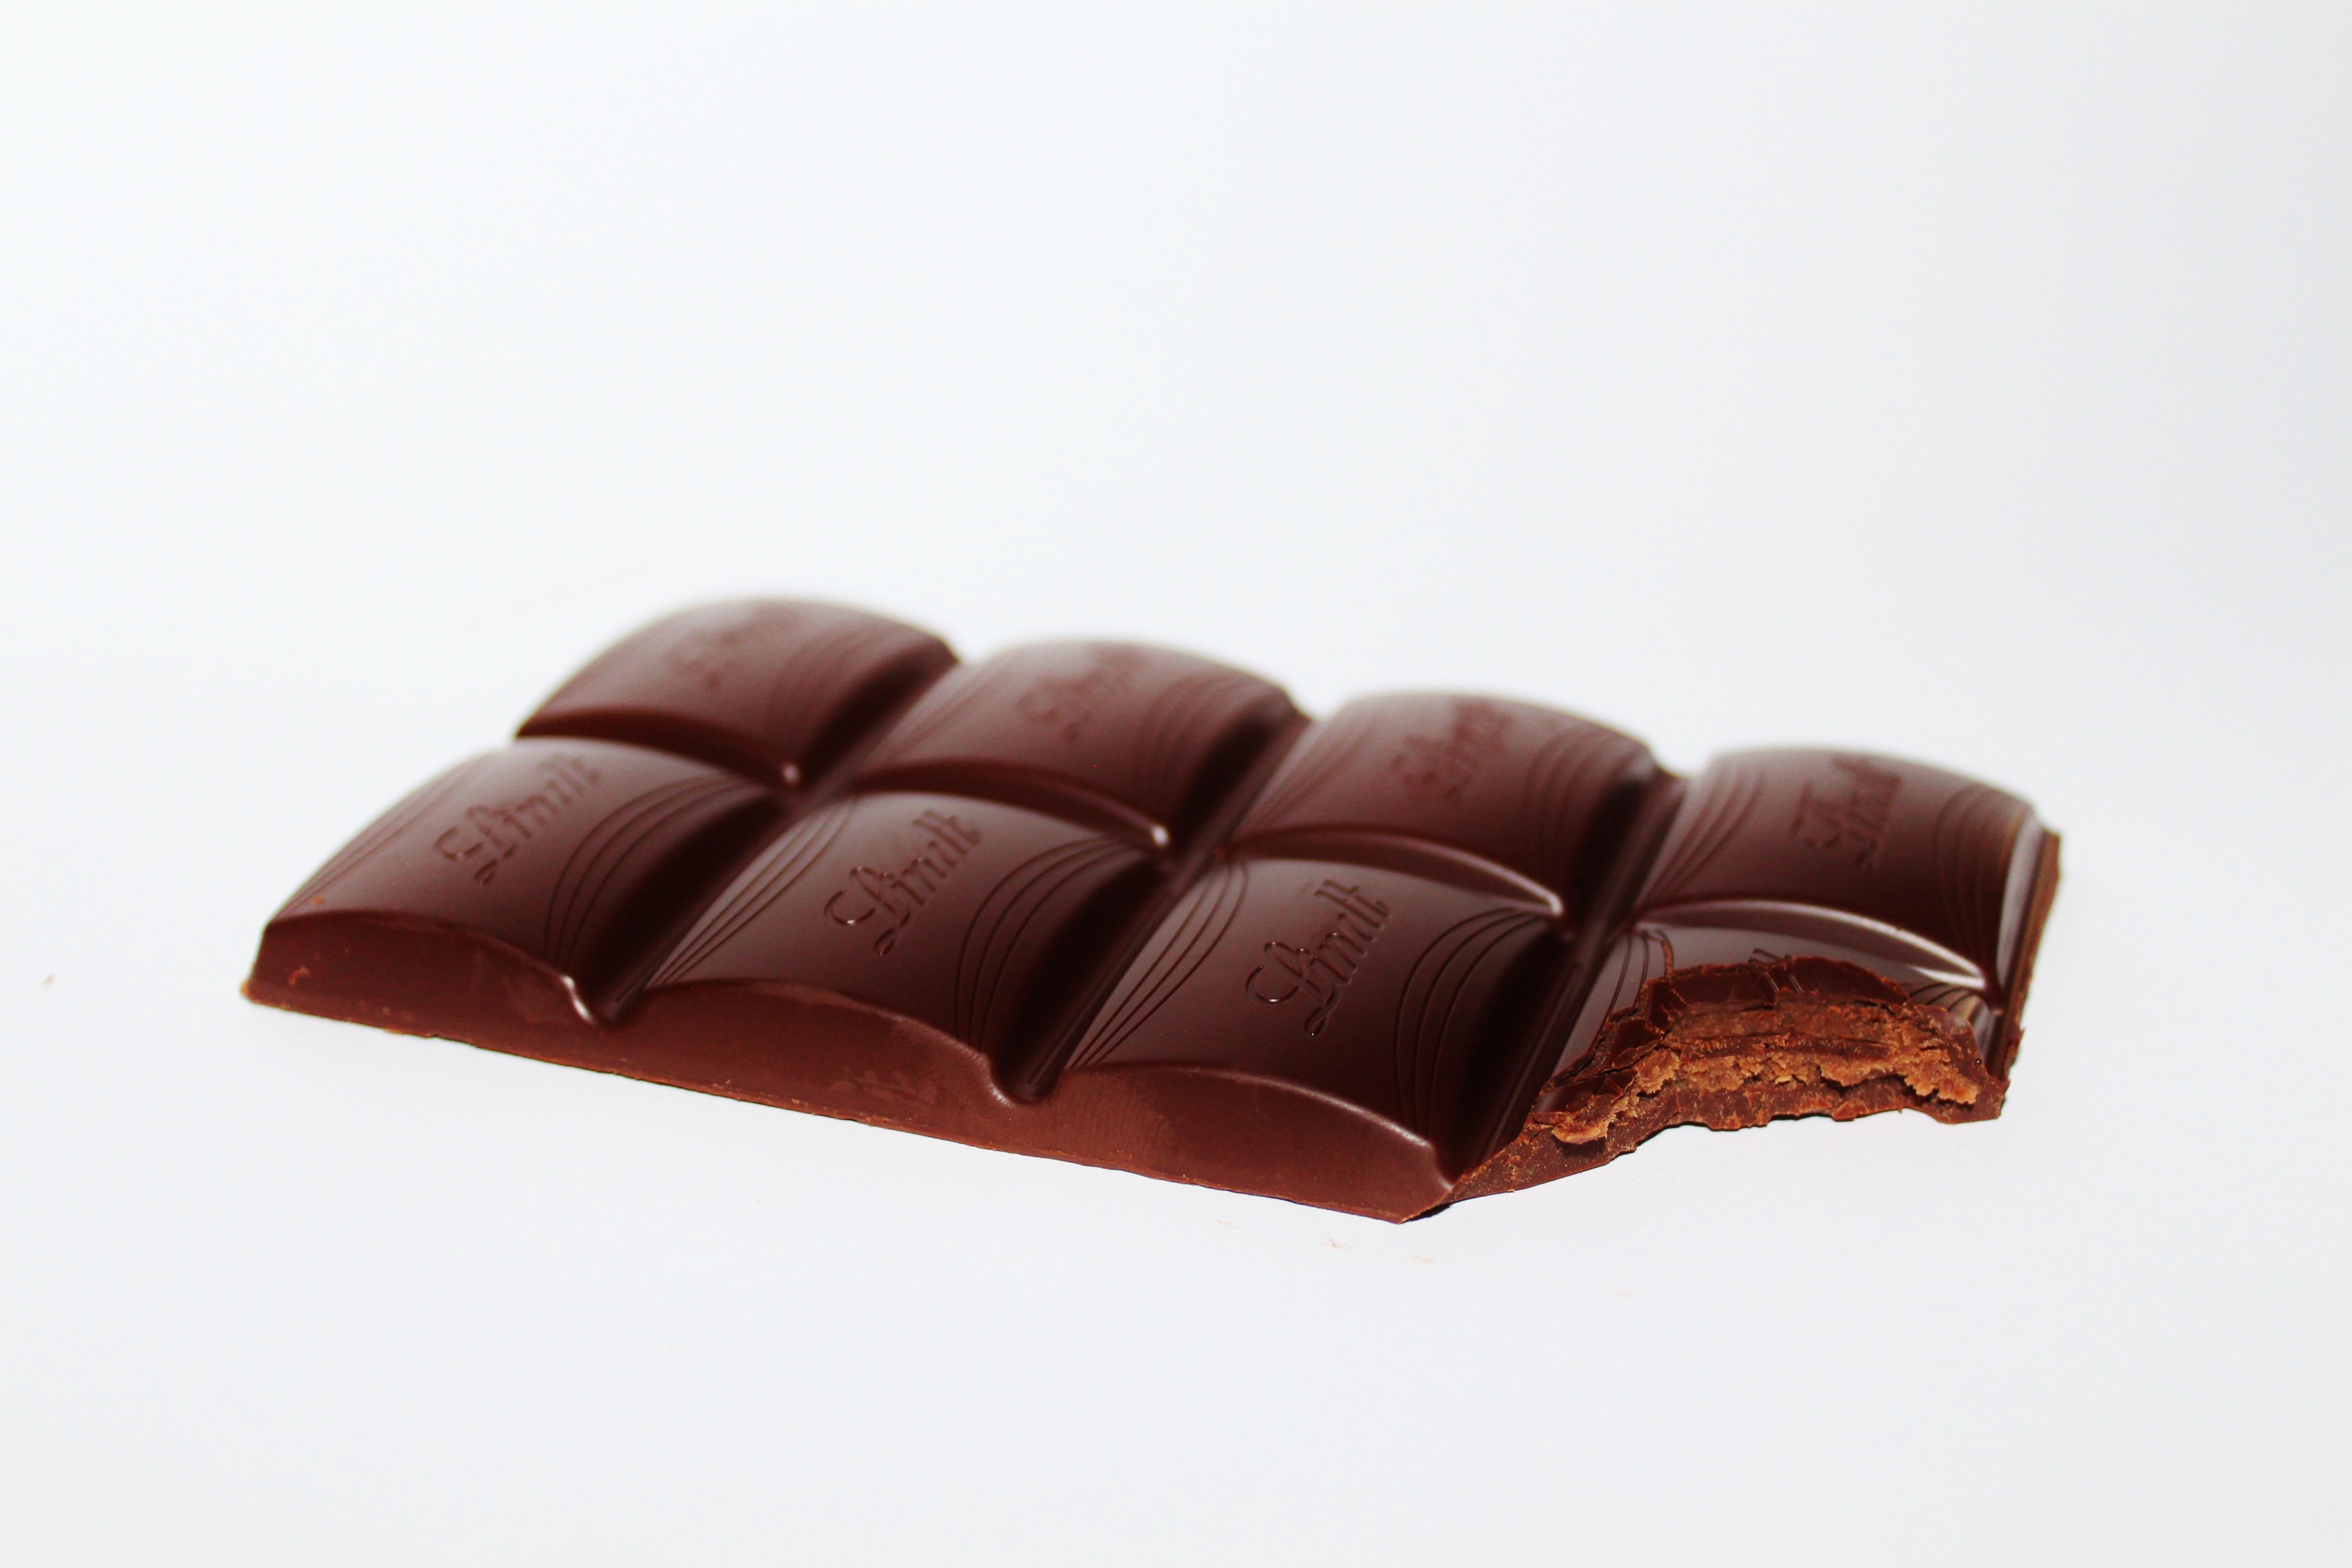 Brown Chocolate Bar · Free Stock Photo